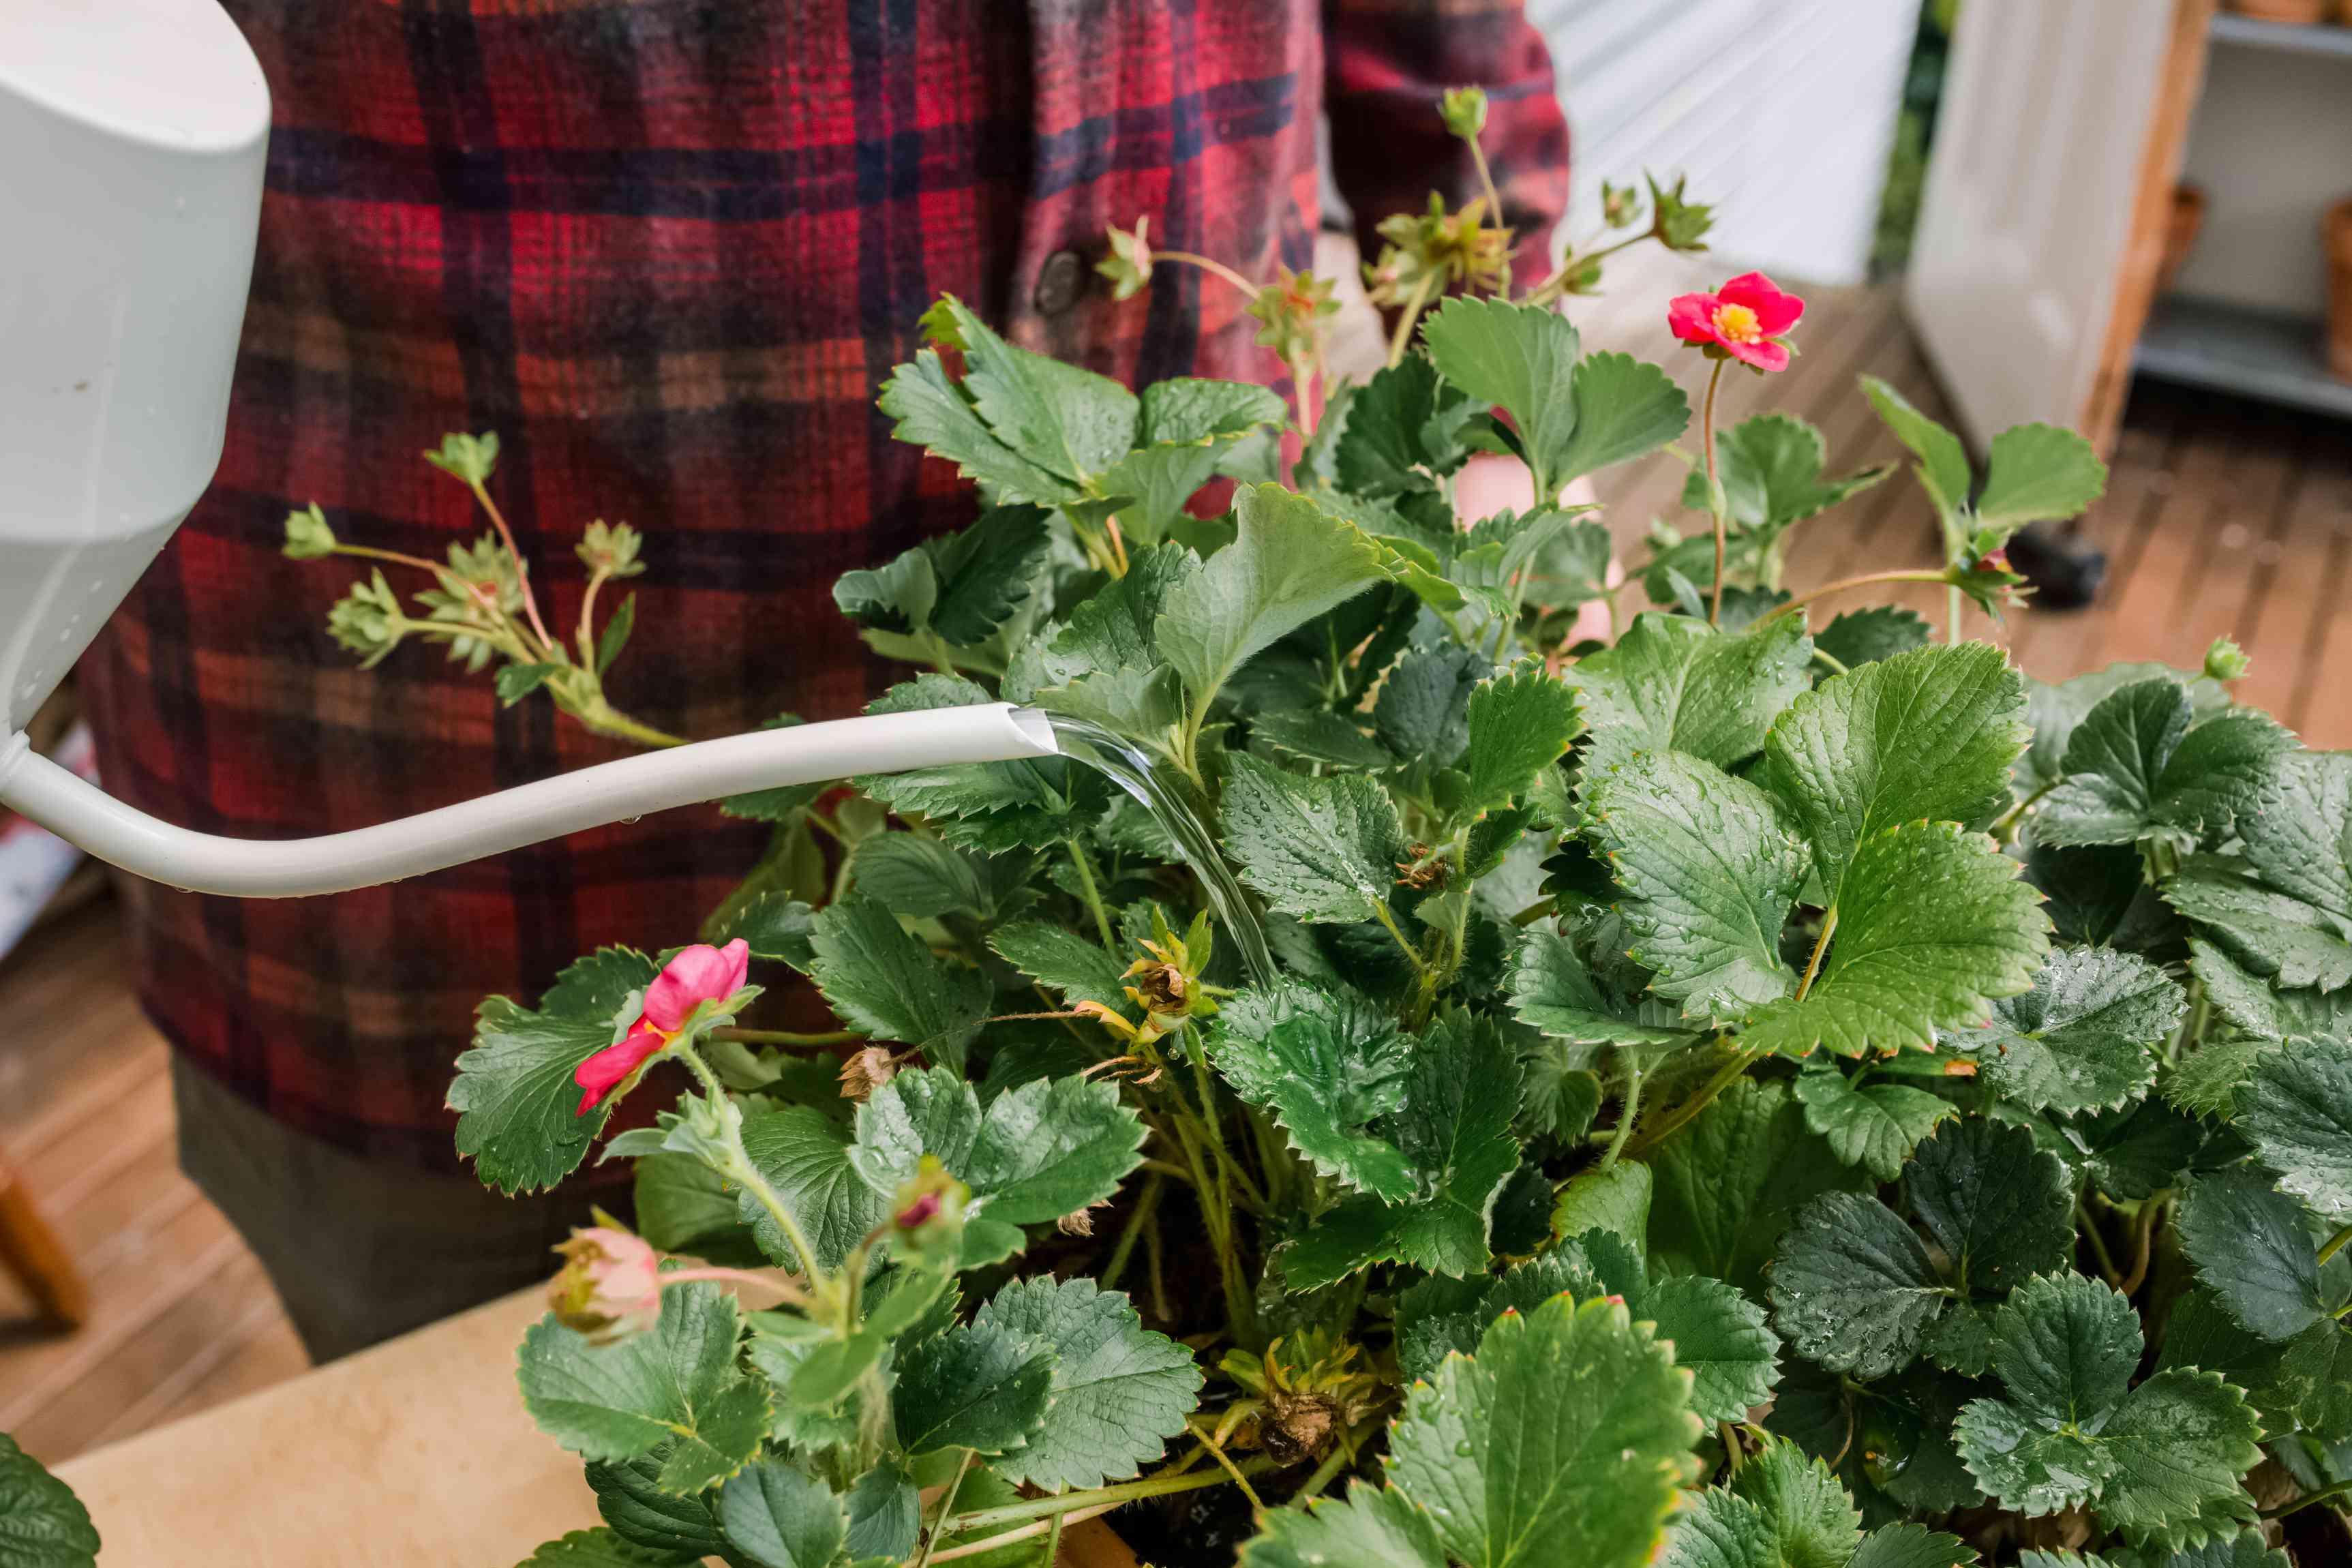 watering strawberry plants